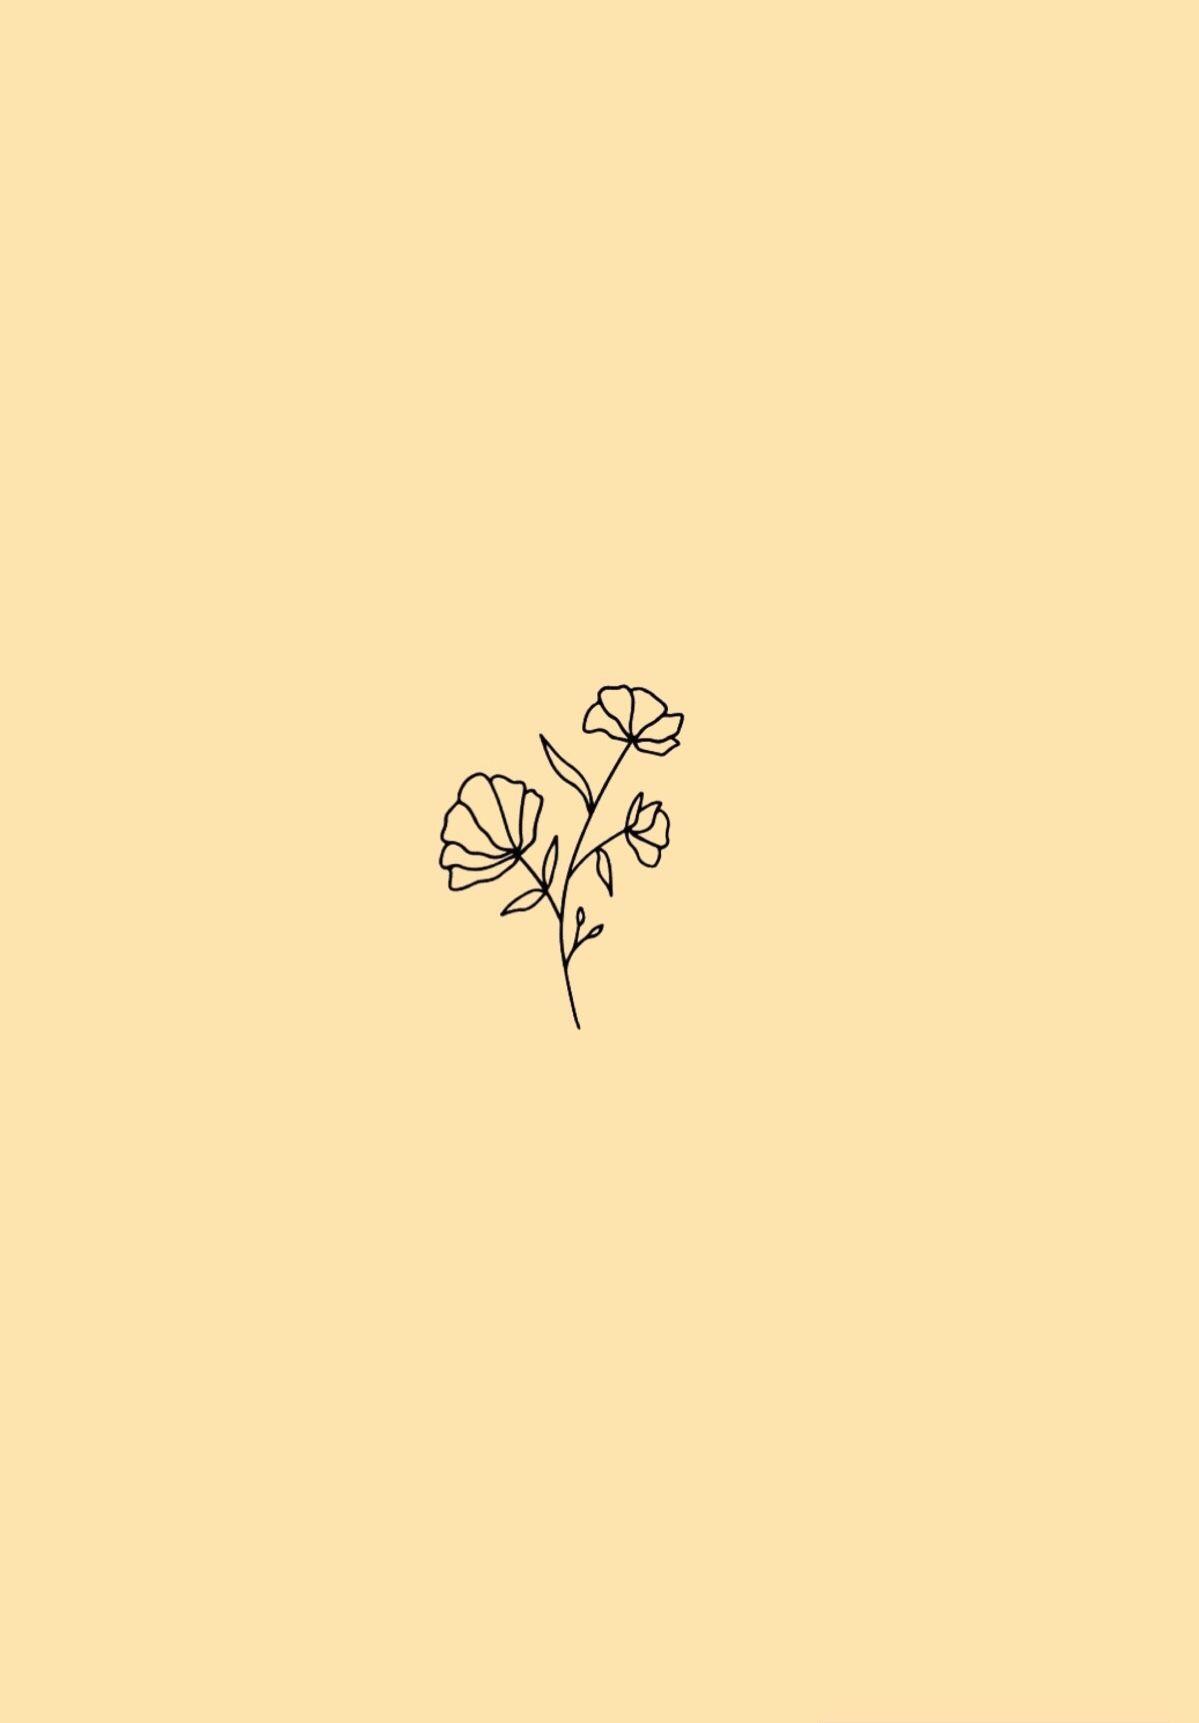 Permalink to Minimalist Flower Aesthetic Wallpaper